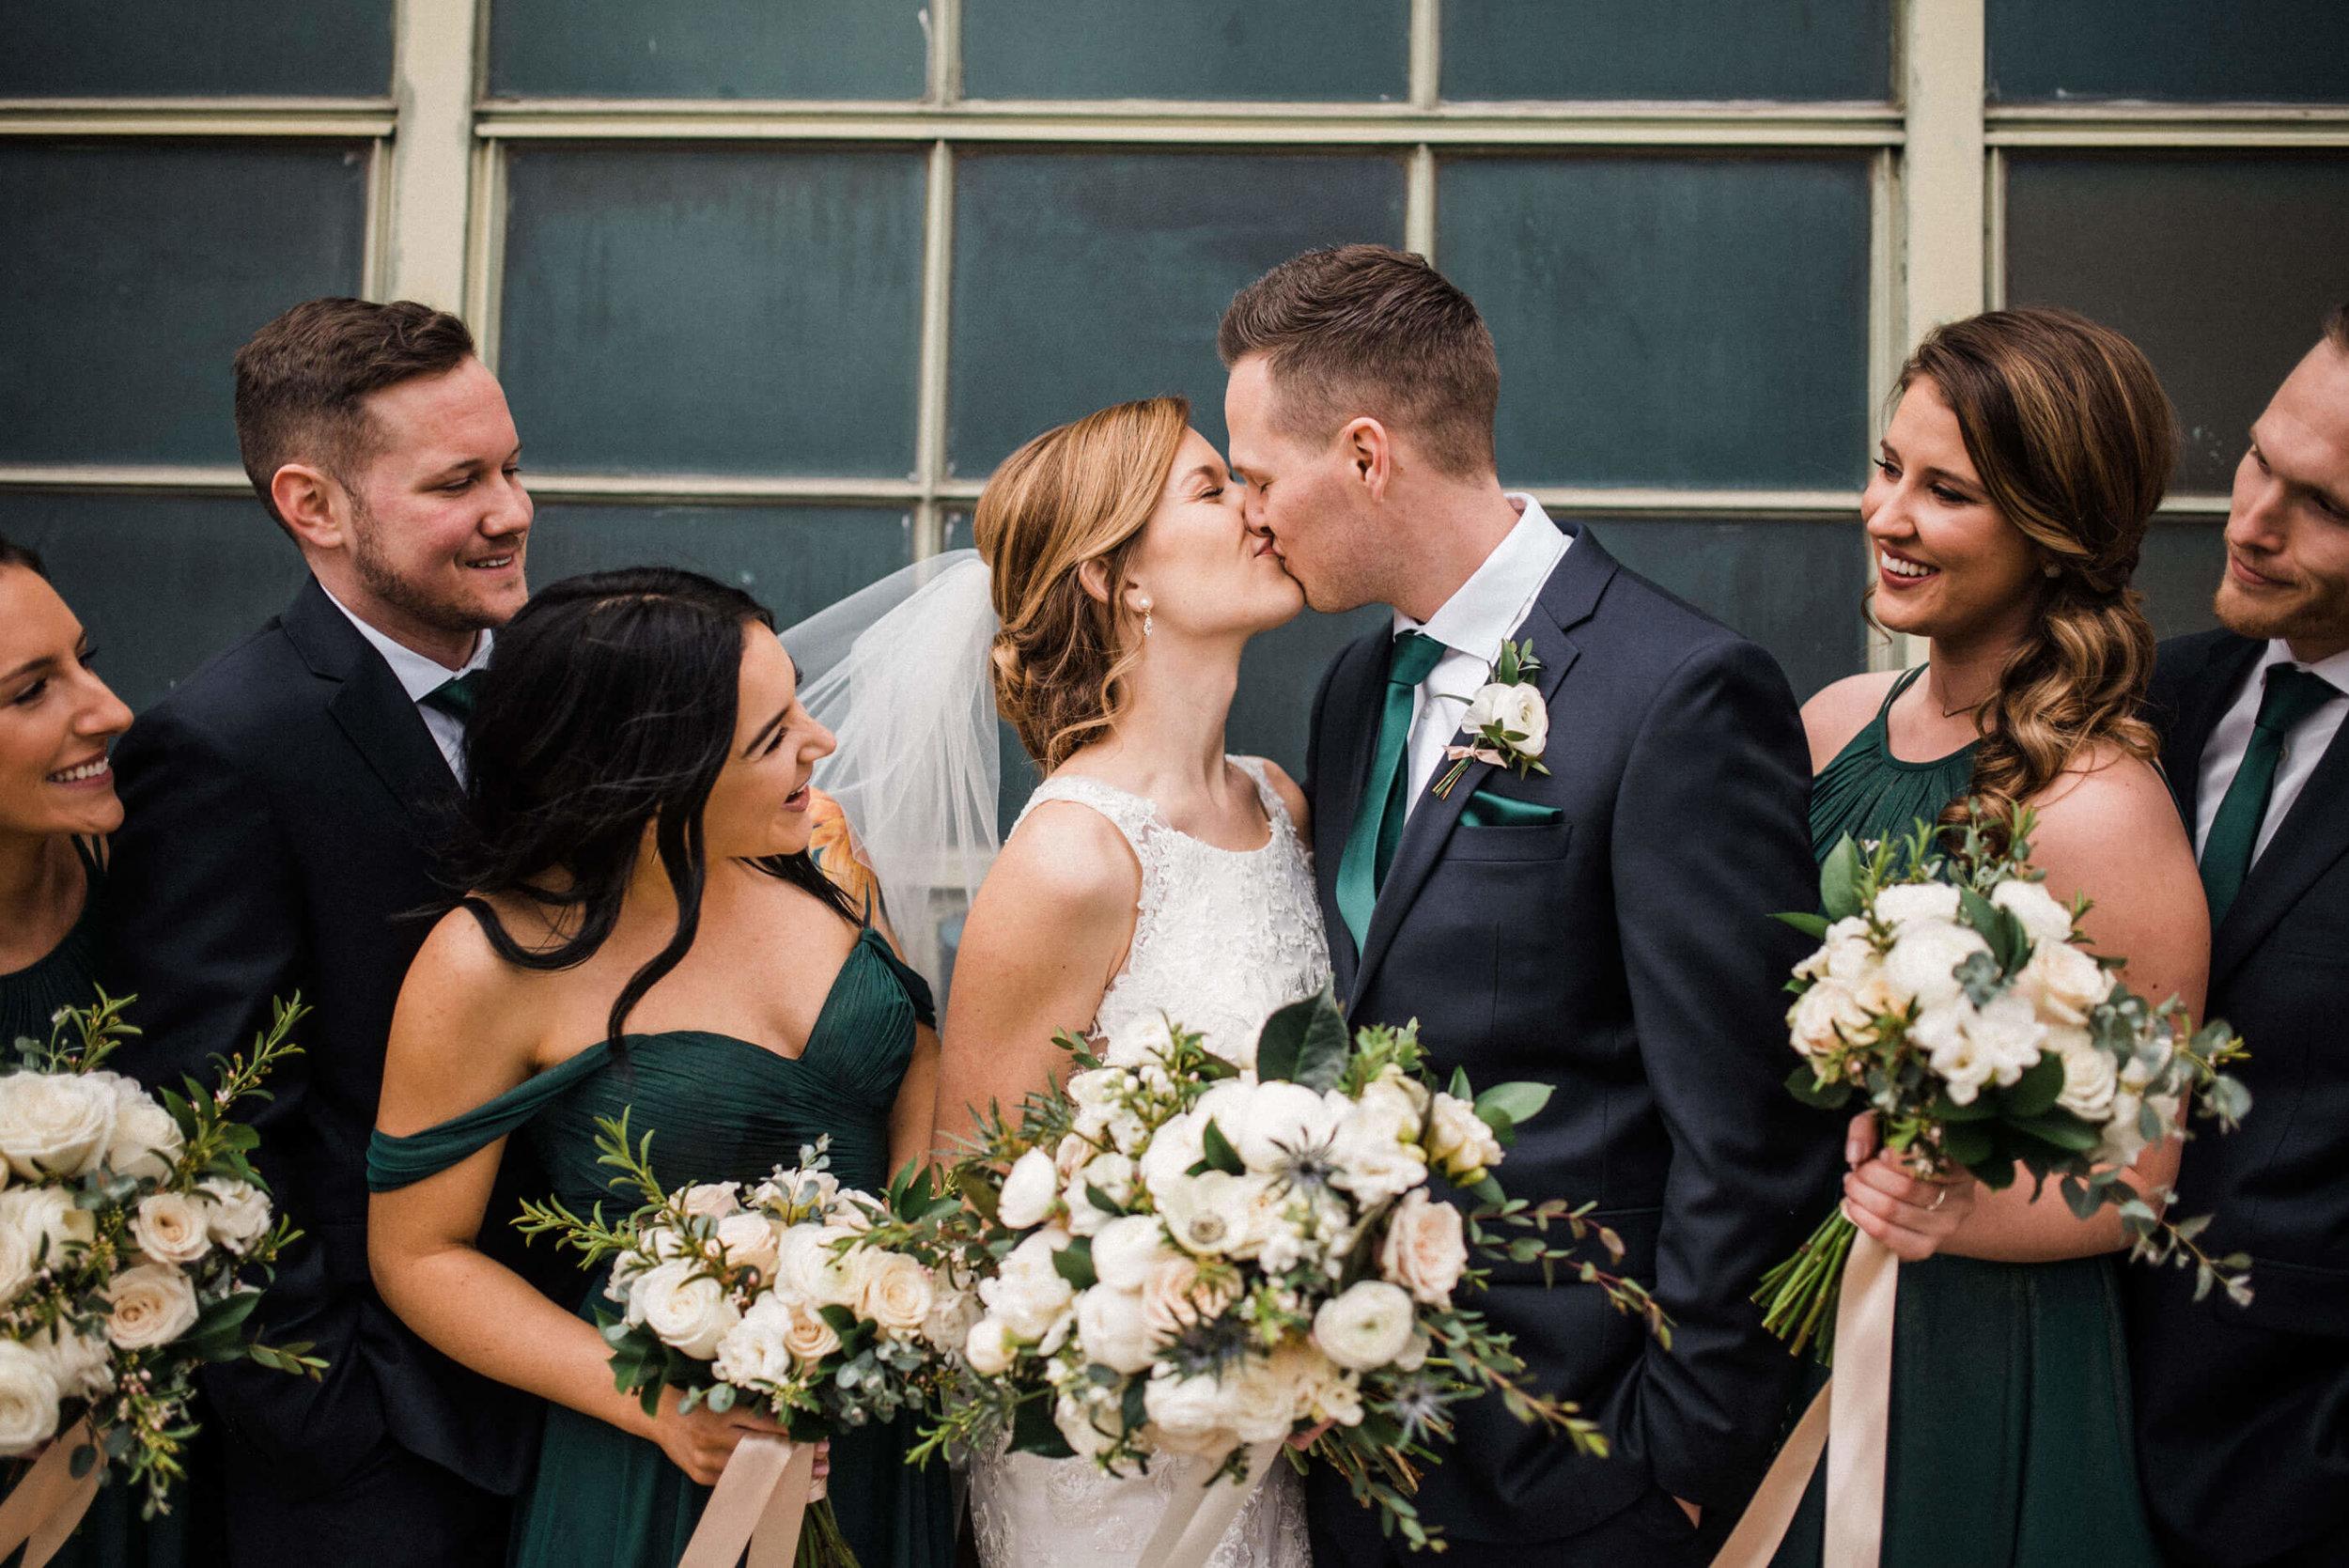 Top of the Market Wedding | Dayton Wedding Photographer